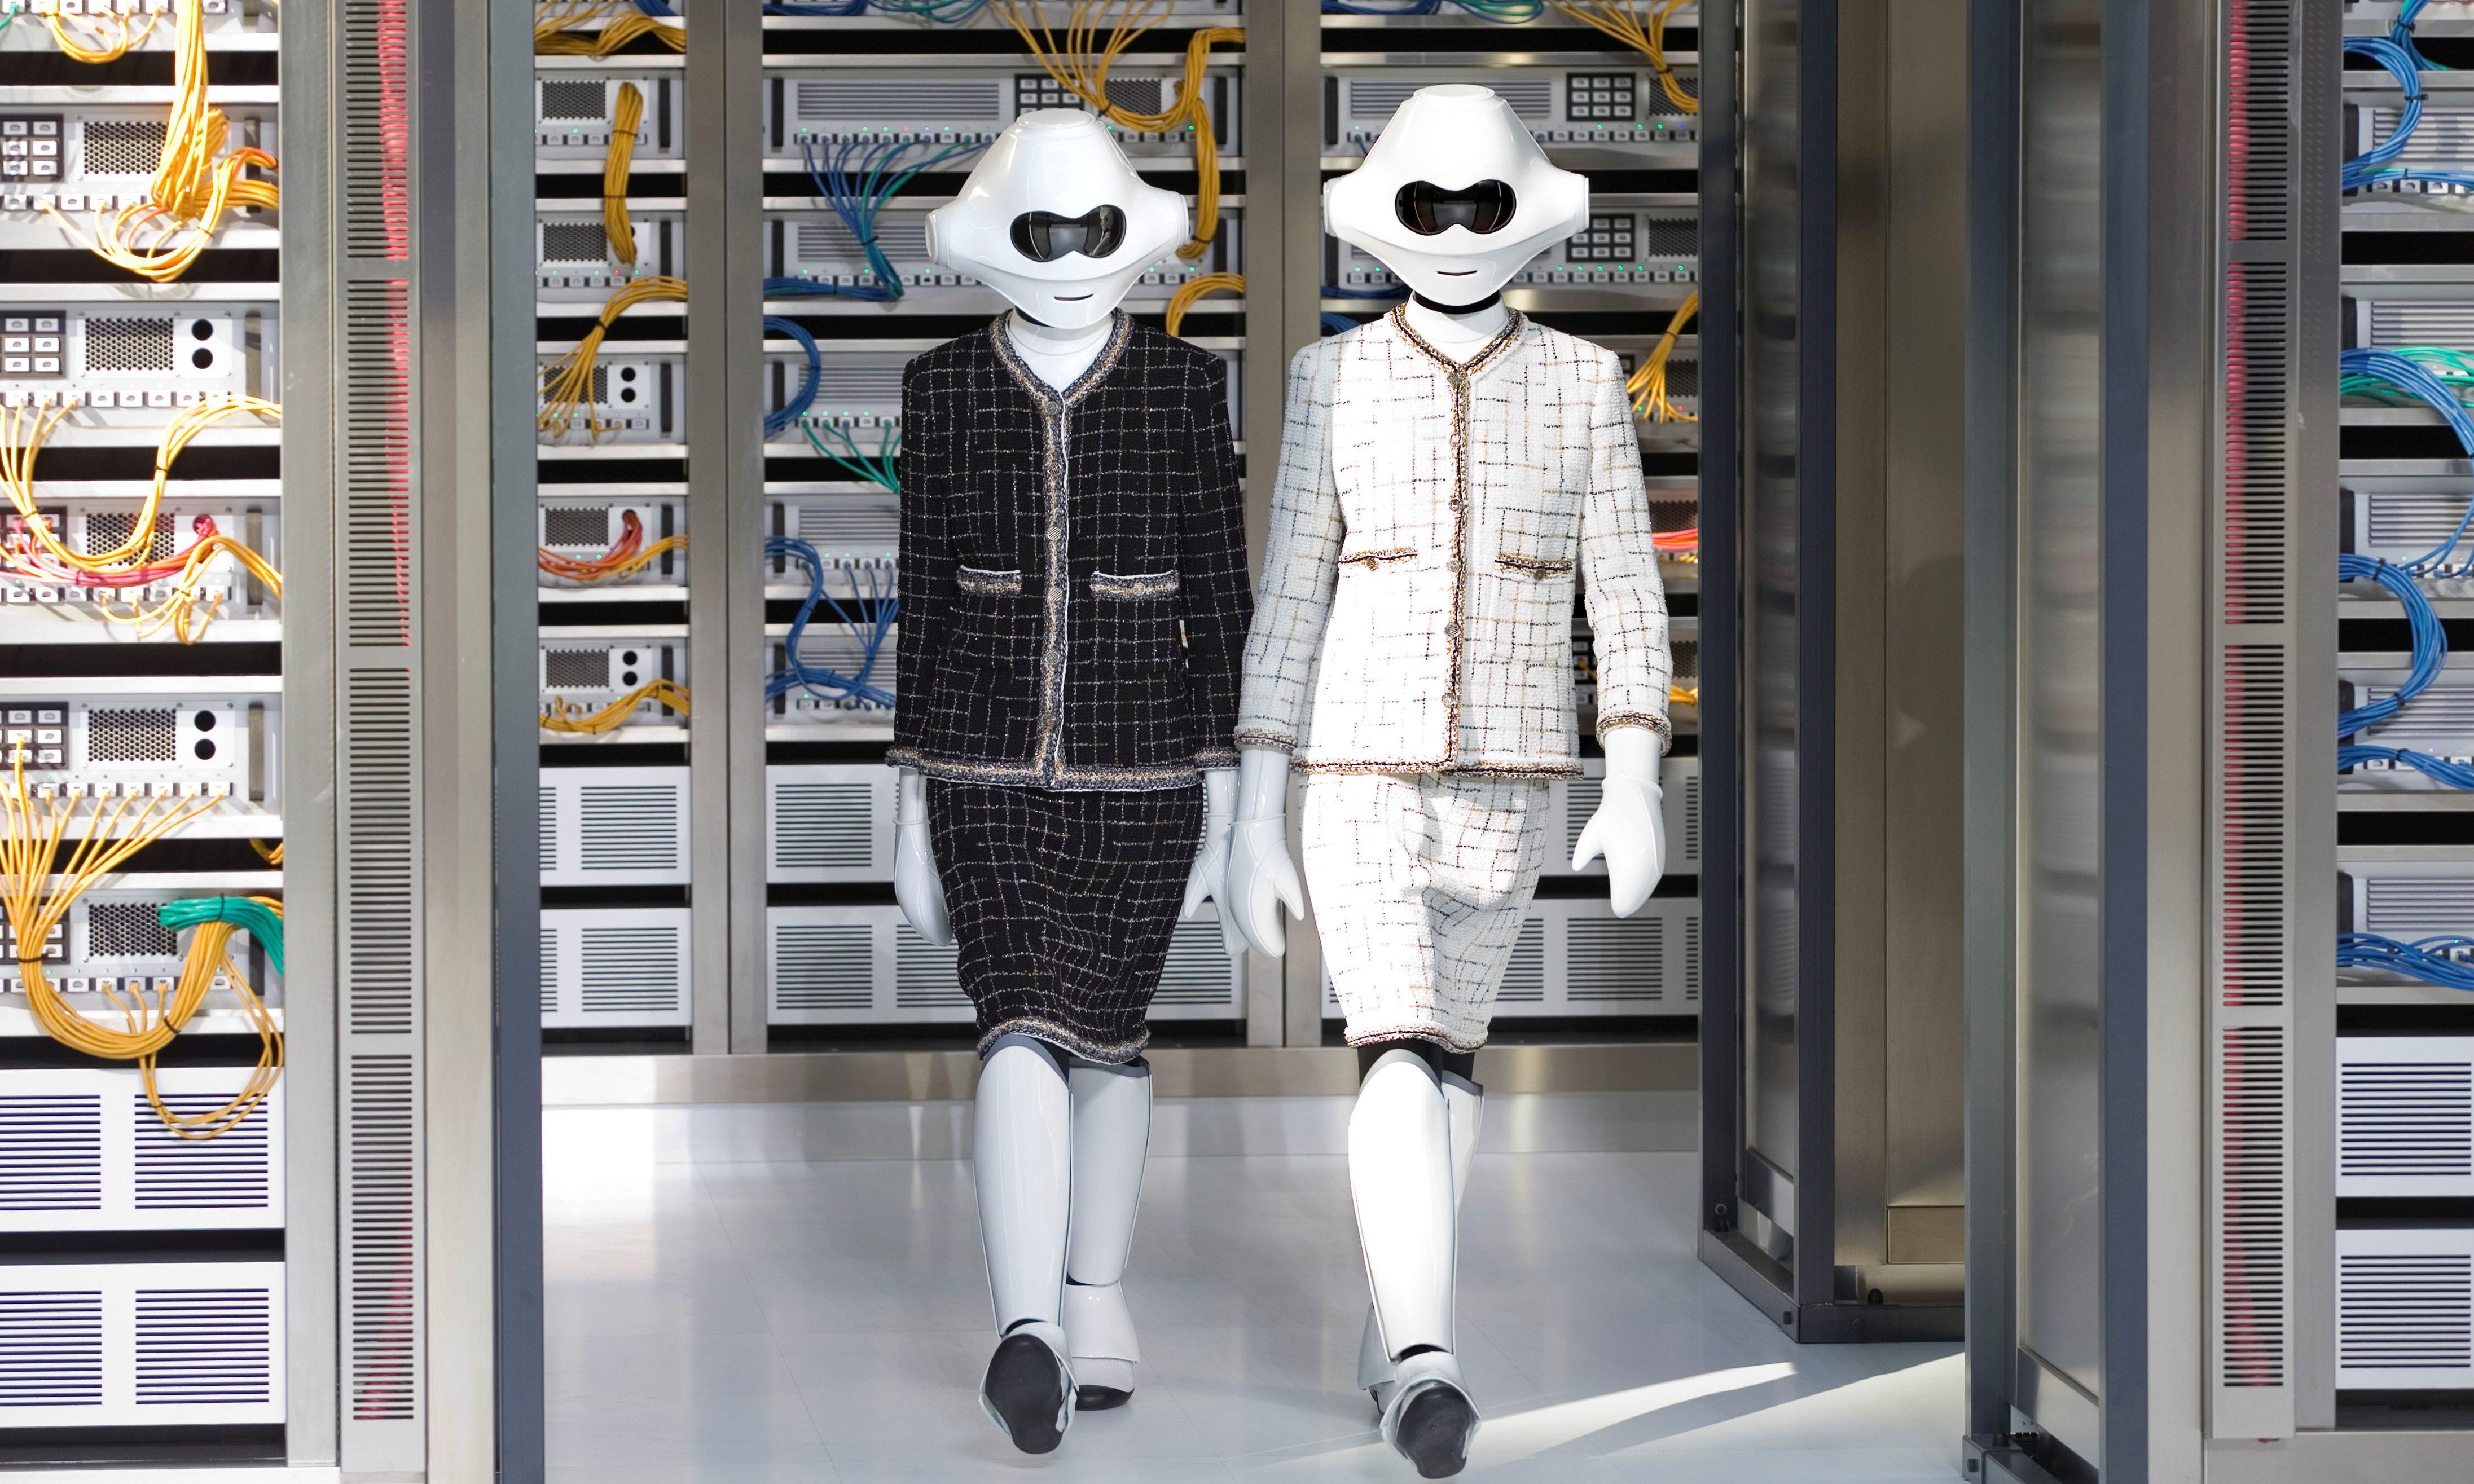 Amazon's new AI algorithm designs clothes without human